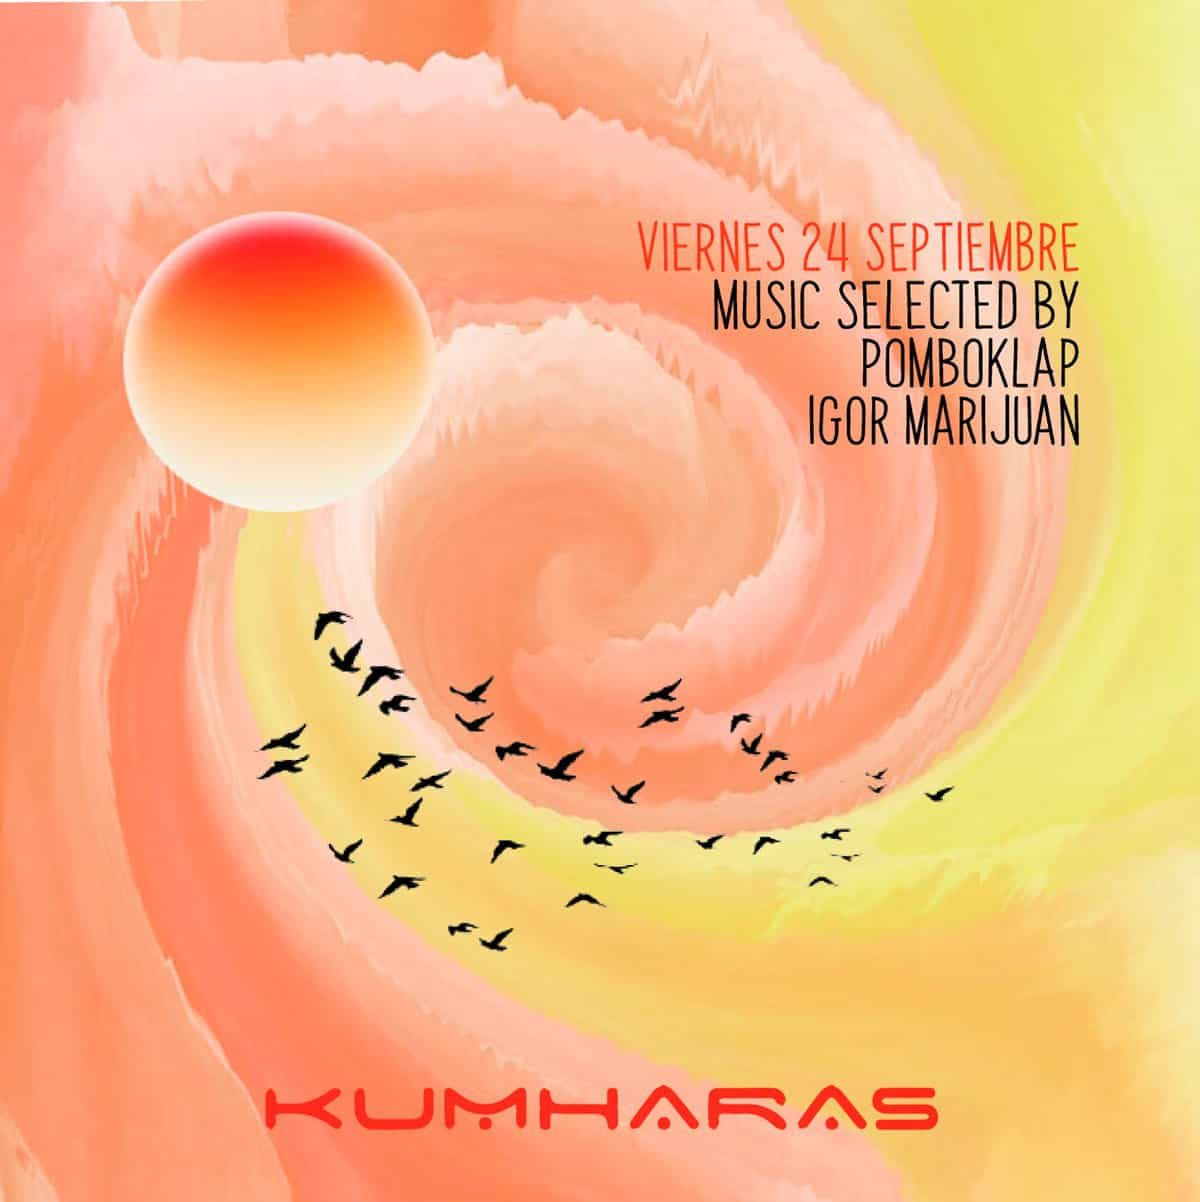 kumharas-ibiza-2021-pomboklab-igor-marihuan-welcometoibiza